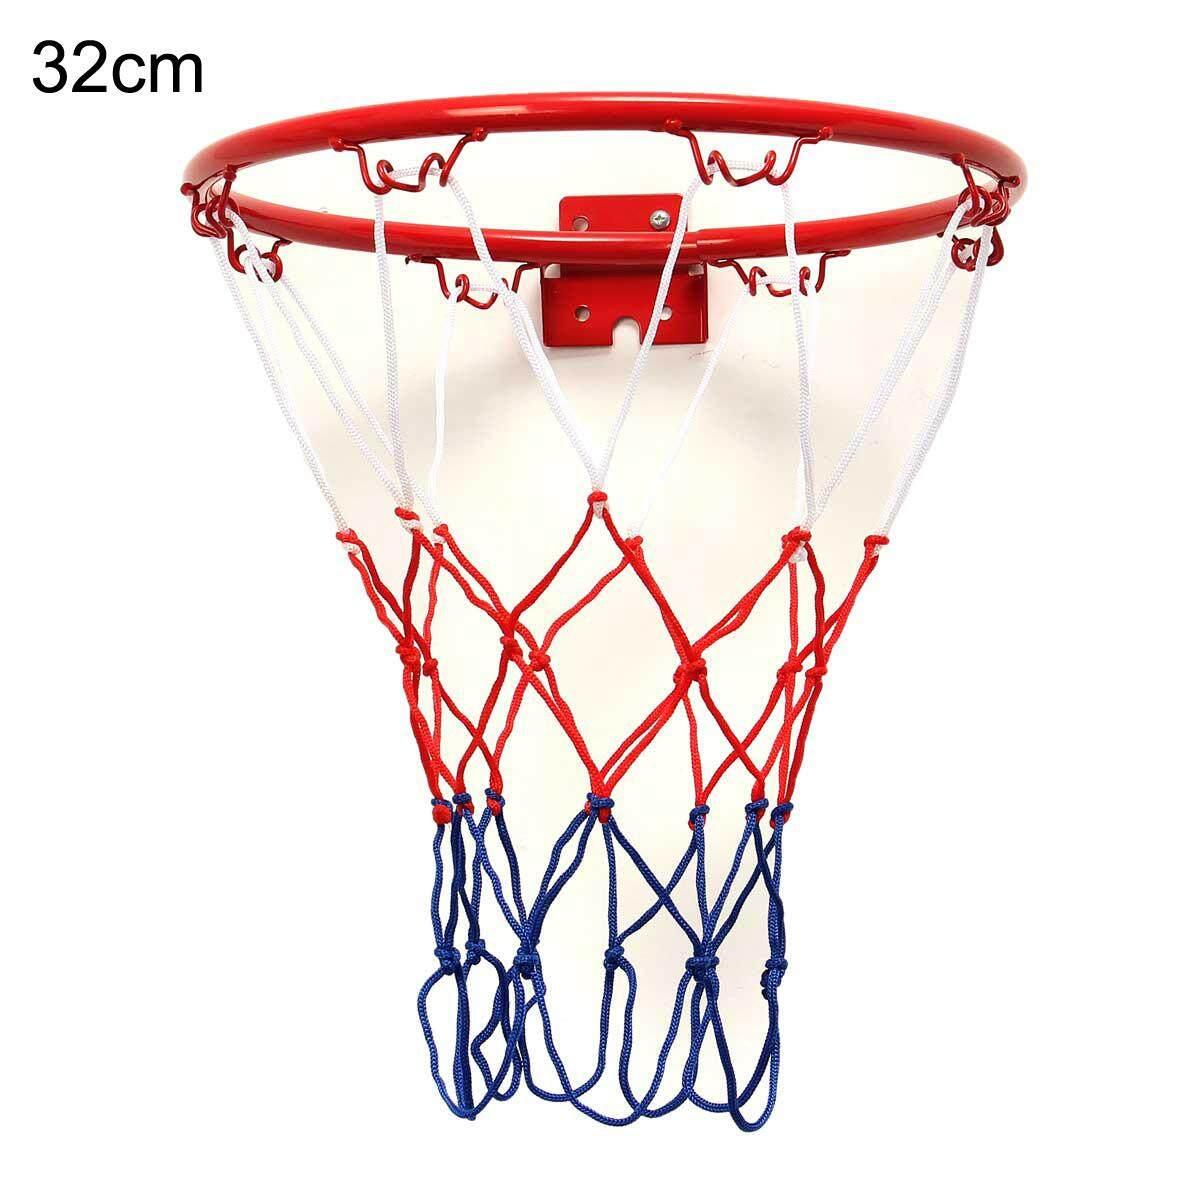 32cm 45cm Basketball Hoop Net Ring Wall Mounted Outdoor Indoor Hanging  Basket 0e72d133dd41f